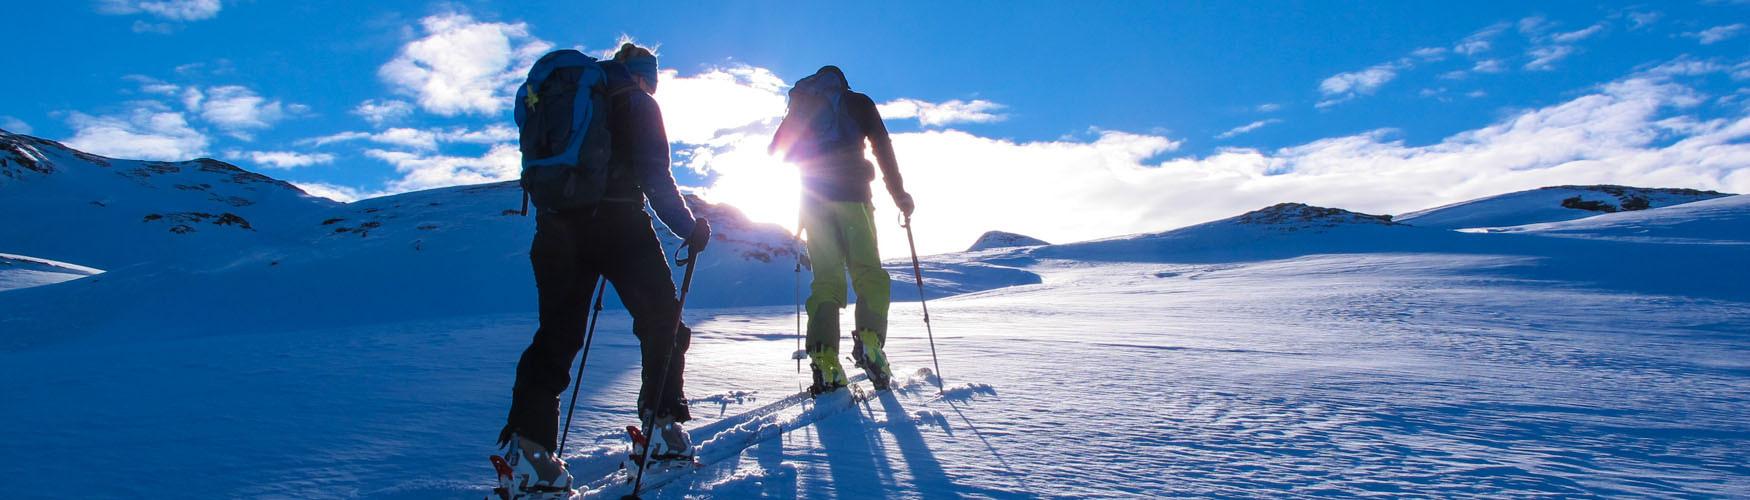 Skitourentraining